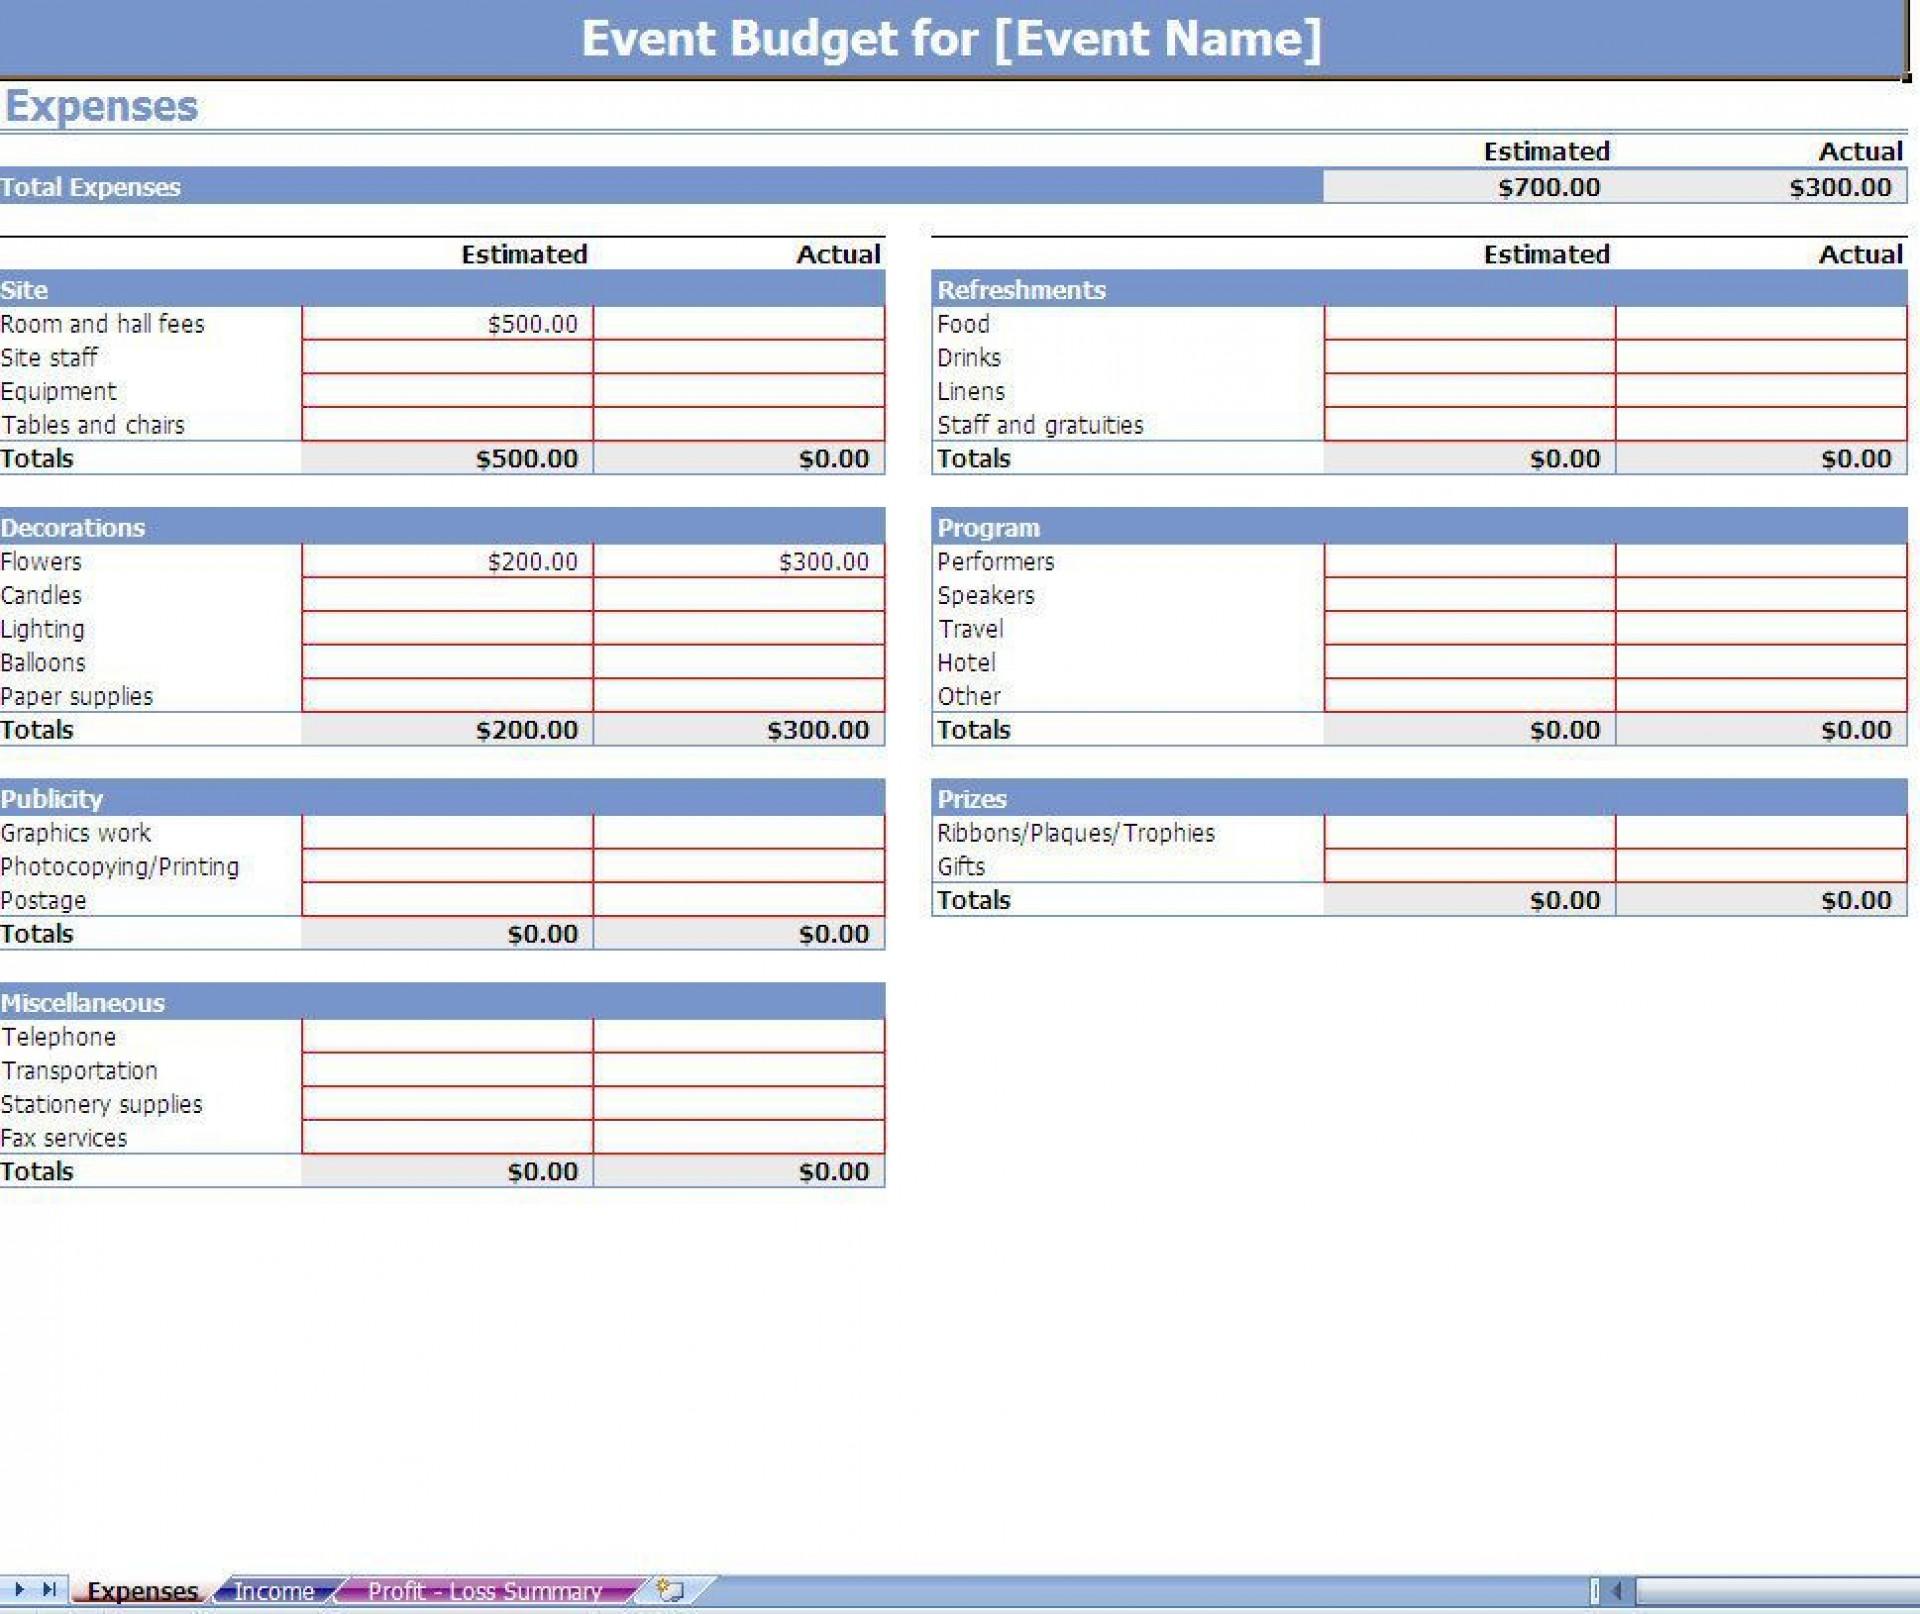 002 Impressive Event Planning Budget Worksheet Template Picture  Free Download Planner Spreadsheet1920